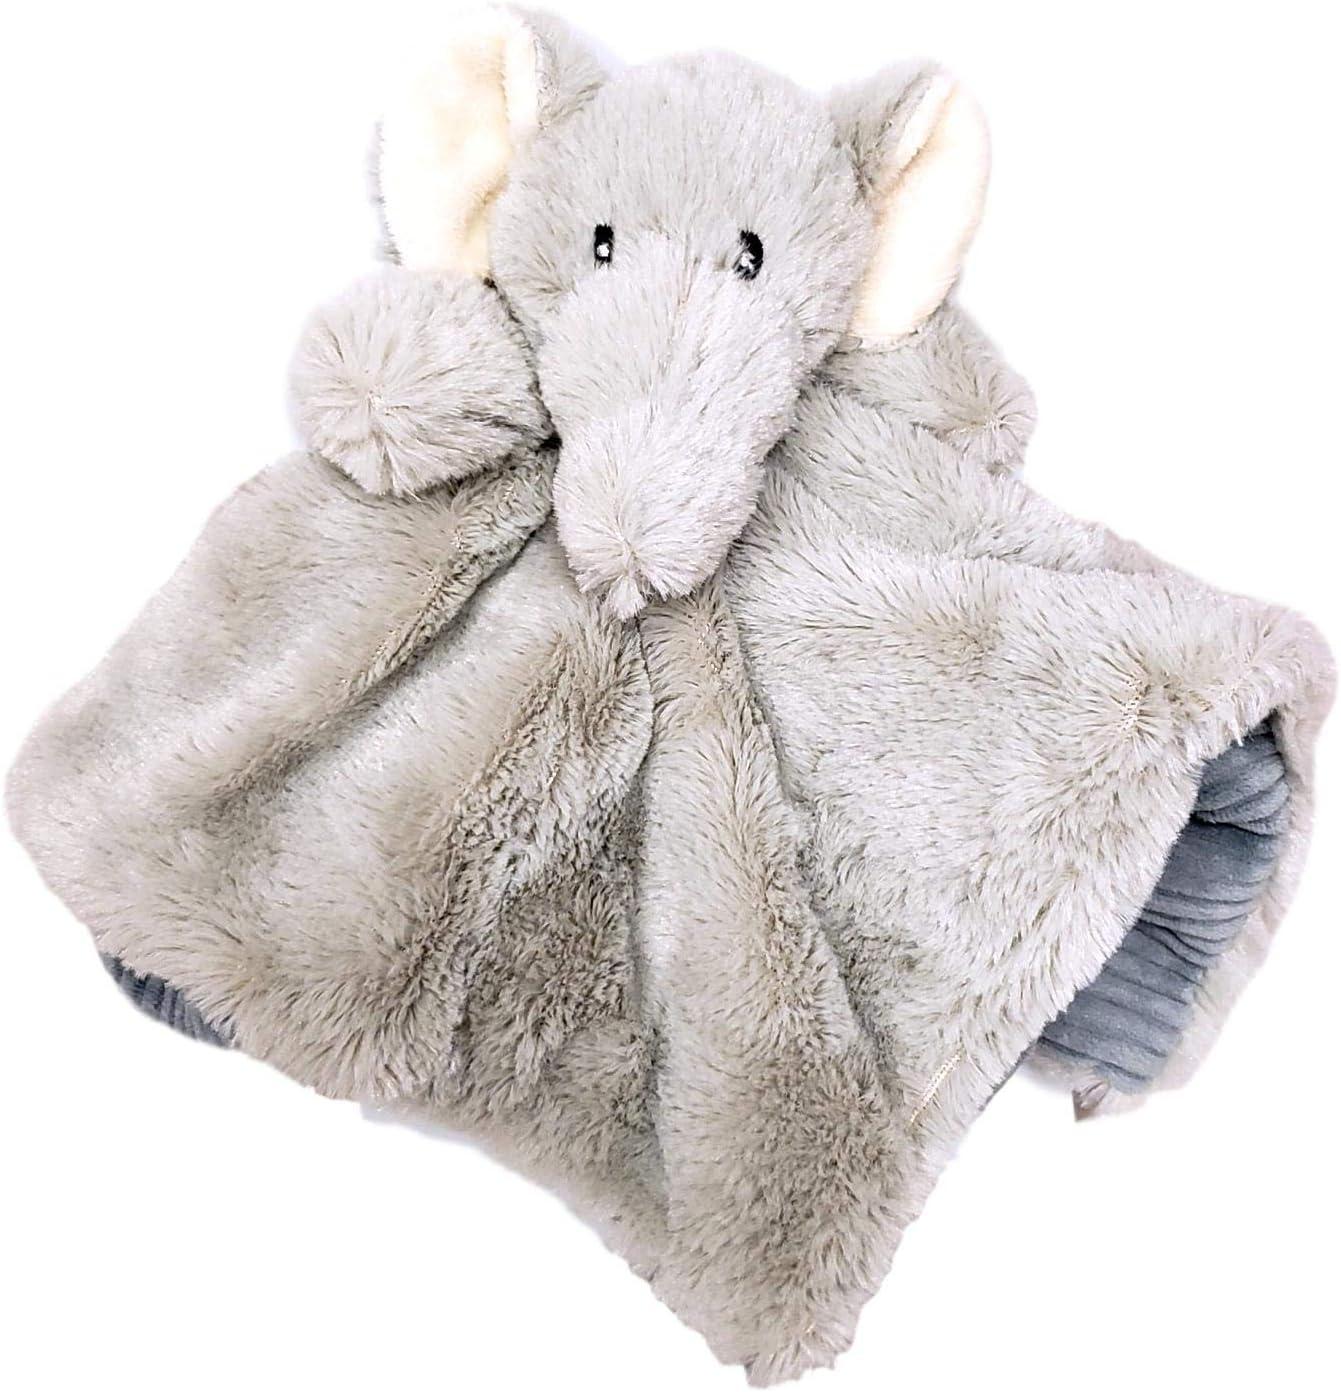 Gender Neutral Lovey Transitional Object Pine Forest Lovey Lovie Security Blanket Tree Baby Room. Mini Blanket Comfort Object